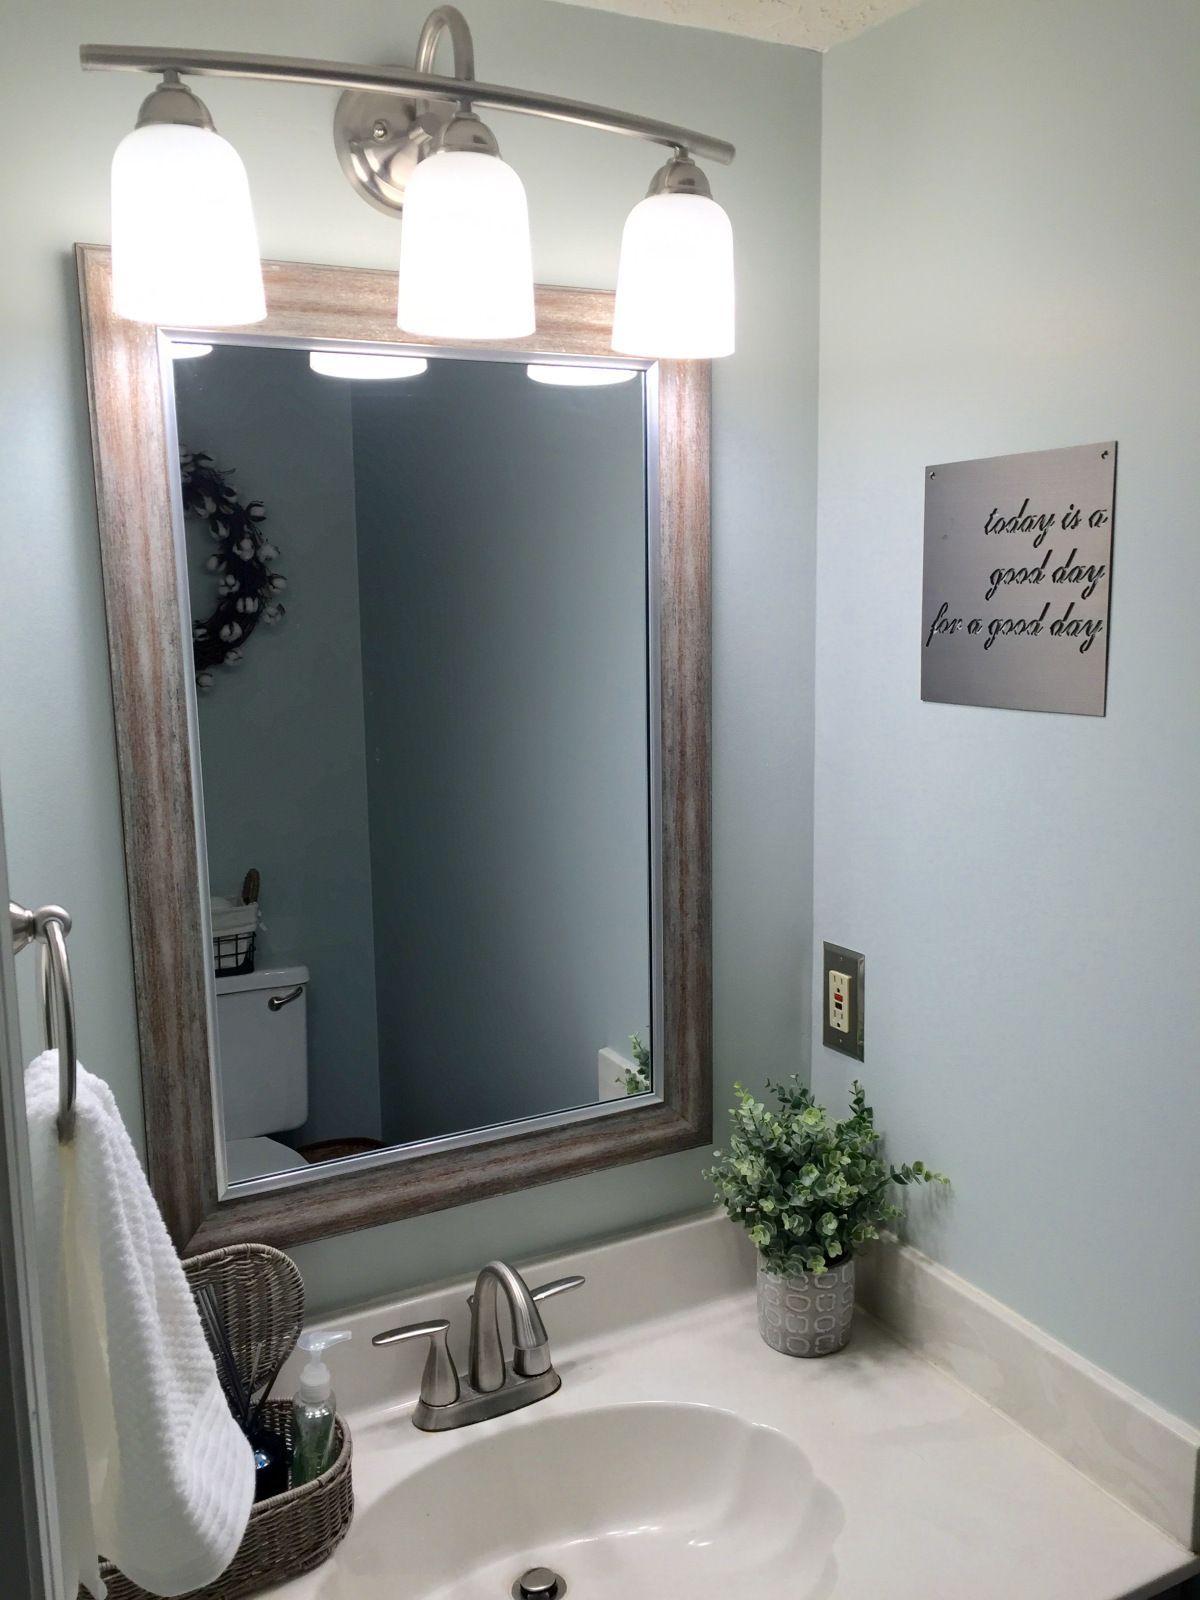 5 Inviting Tips And Tricks Large Bathroom Remodel Diy Half Bathroom Remodel Tile Bathroom Remodel Small Half Baths Small Bathroom Remodel Fixer Upper Bathroom